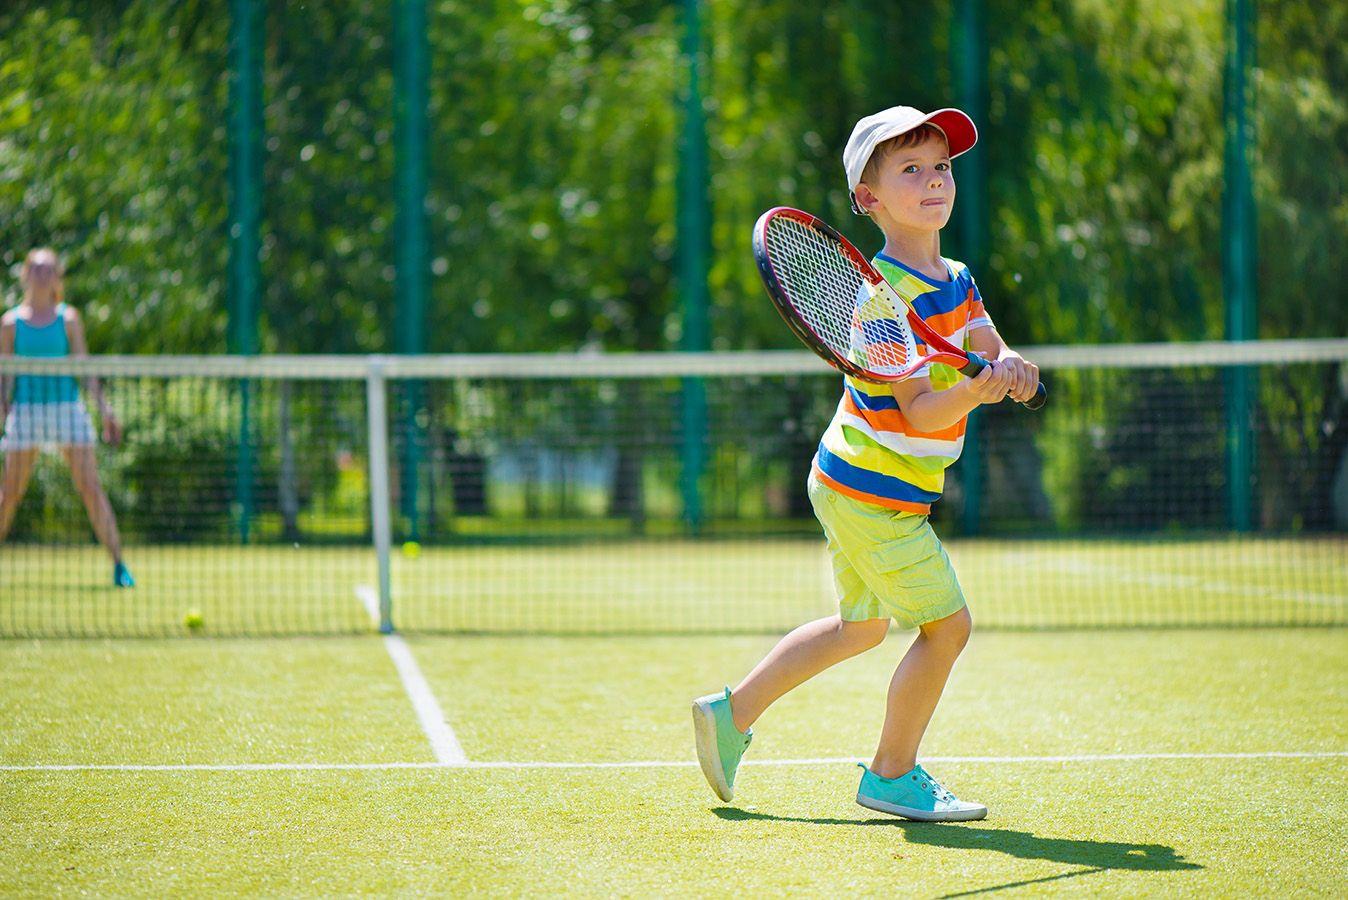 Tennis Basics For Children The Parents Guide Play Tennis Tennis Tennis Serve